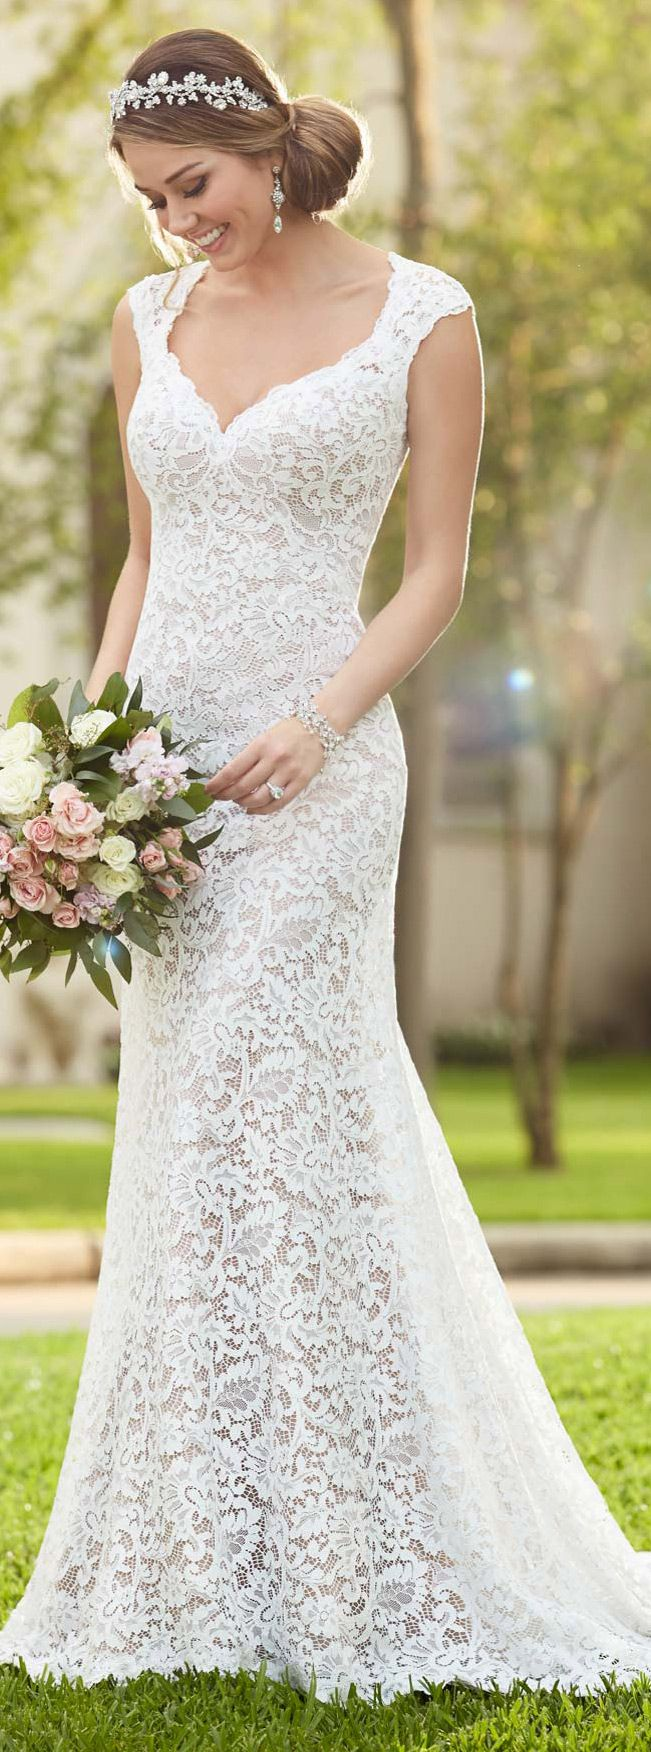 Stella York full lace wedding dress